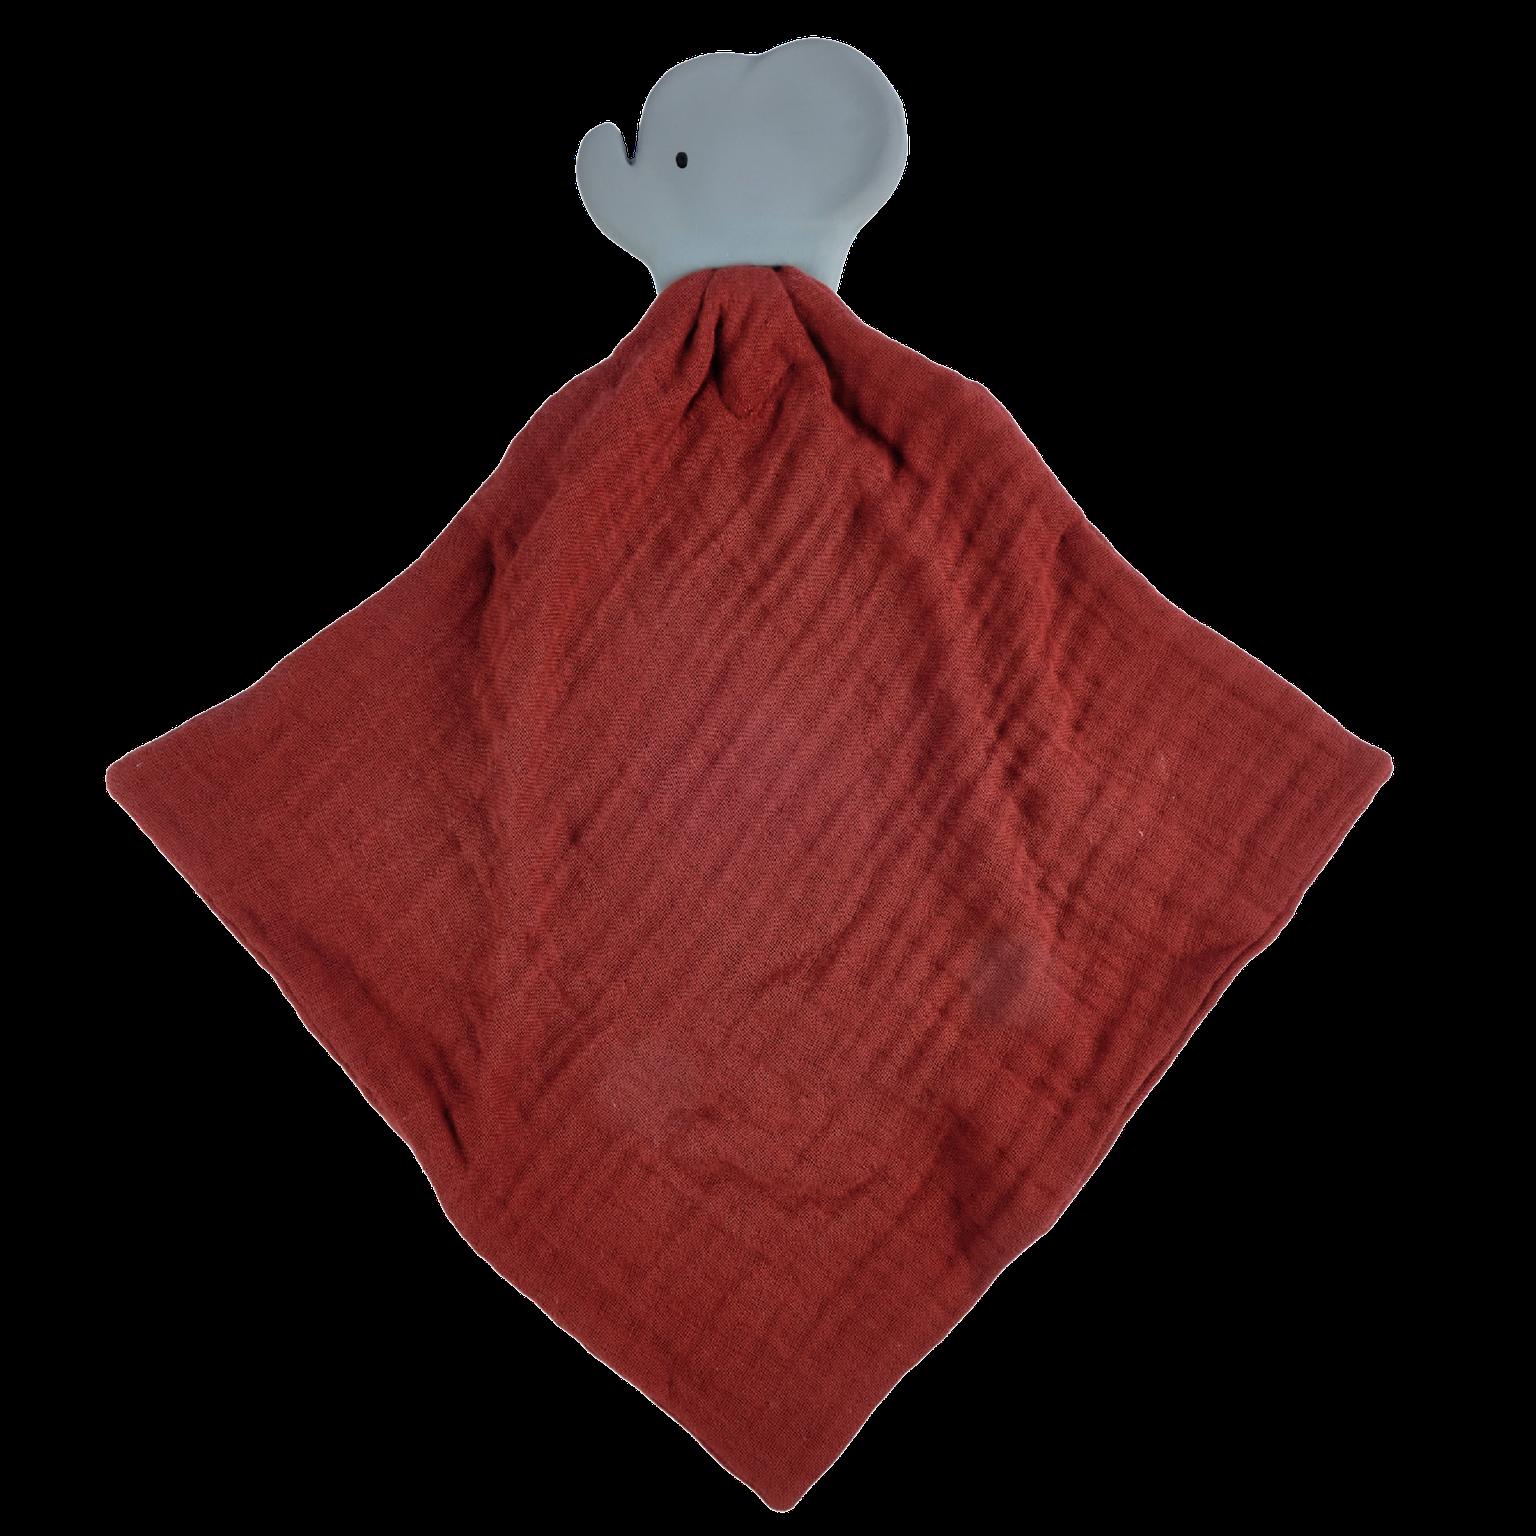 Tikiri Elephant Comforter in Red Muslin w/Natural Rubber Teether